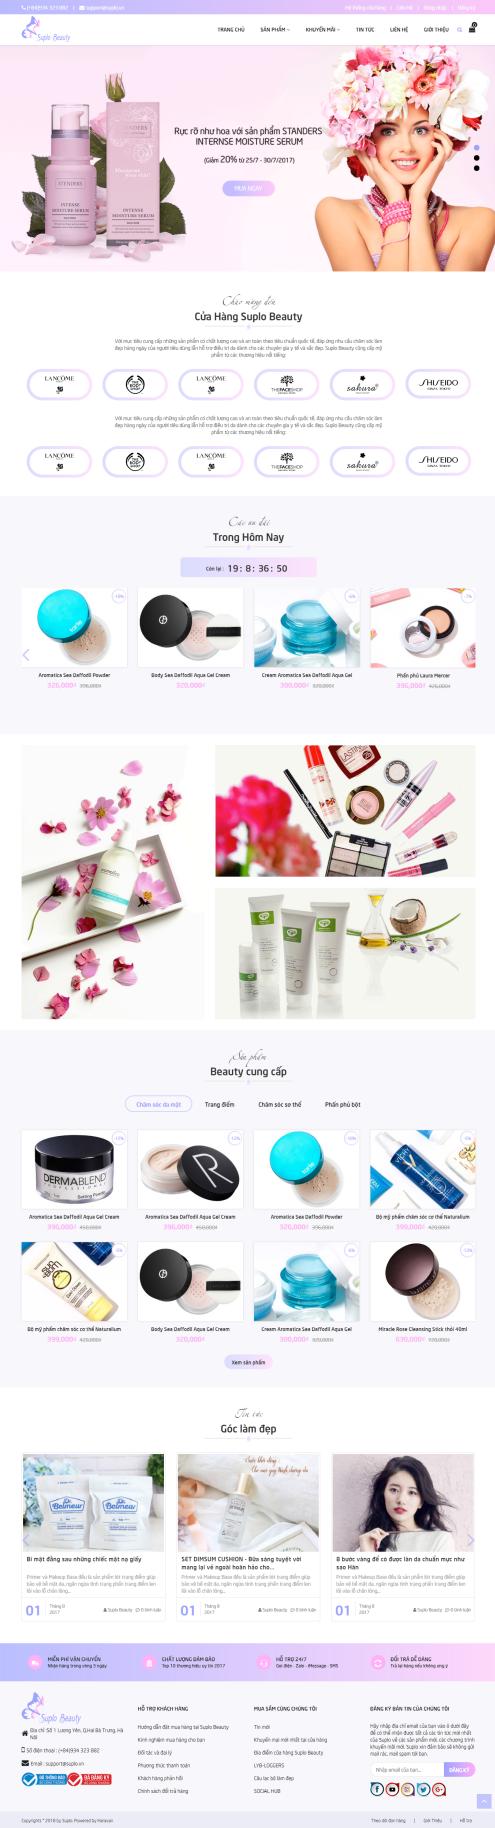 Thiết kế Mẫu website mỹ phẩm MP24